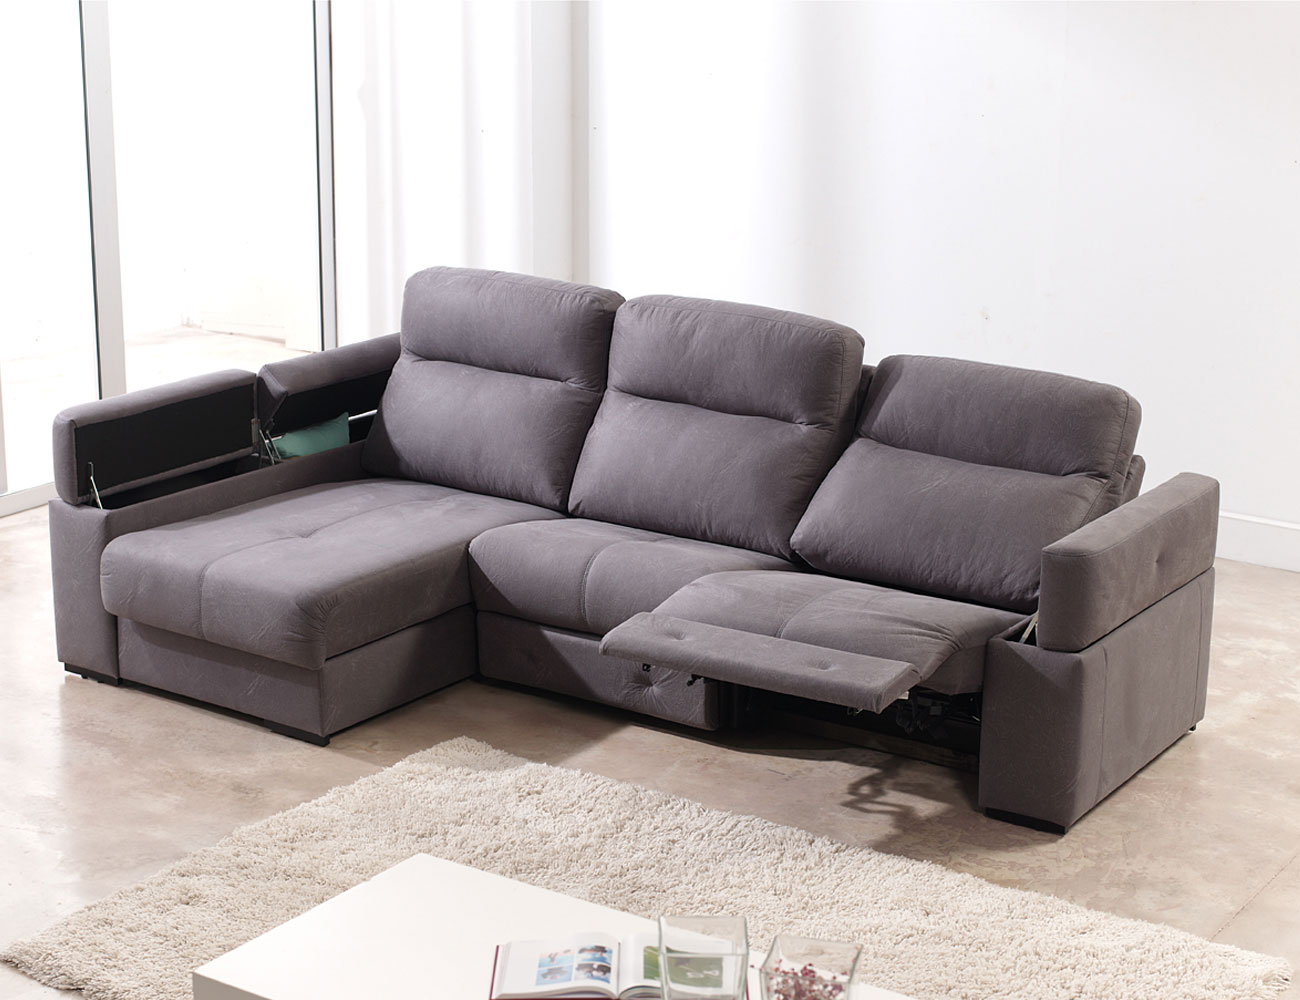 Sofa chaiselongue relax motor electrico 3 arcon 12